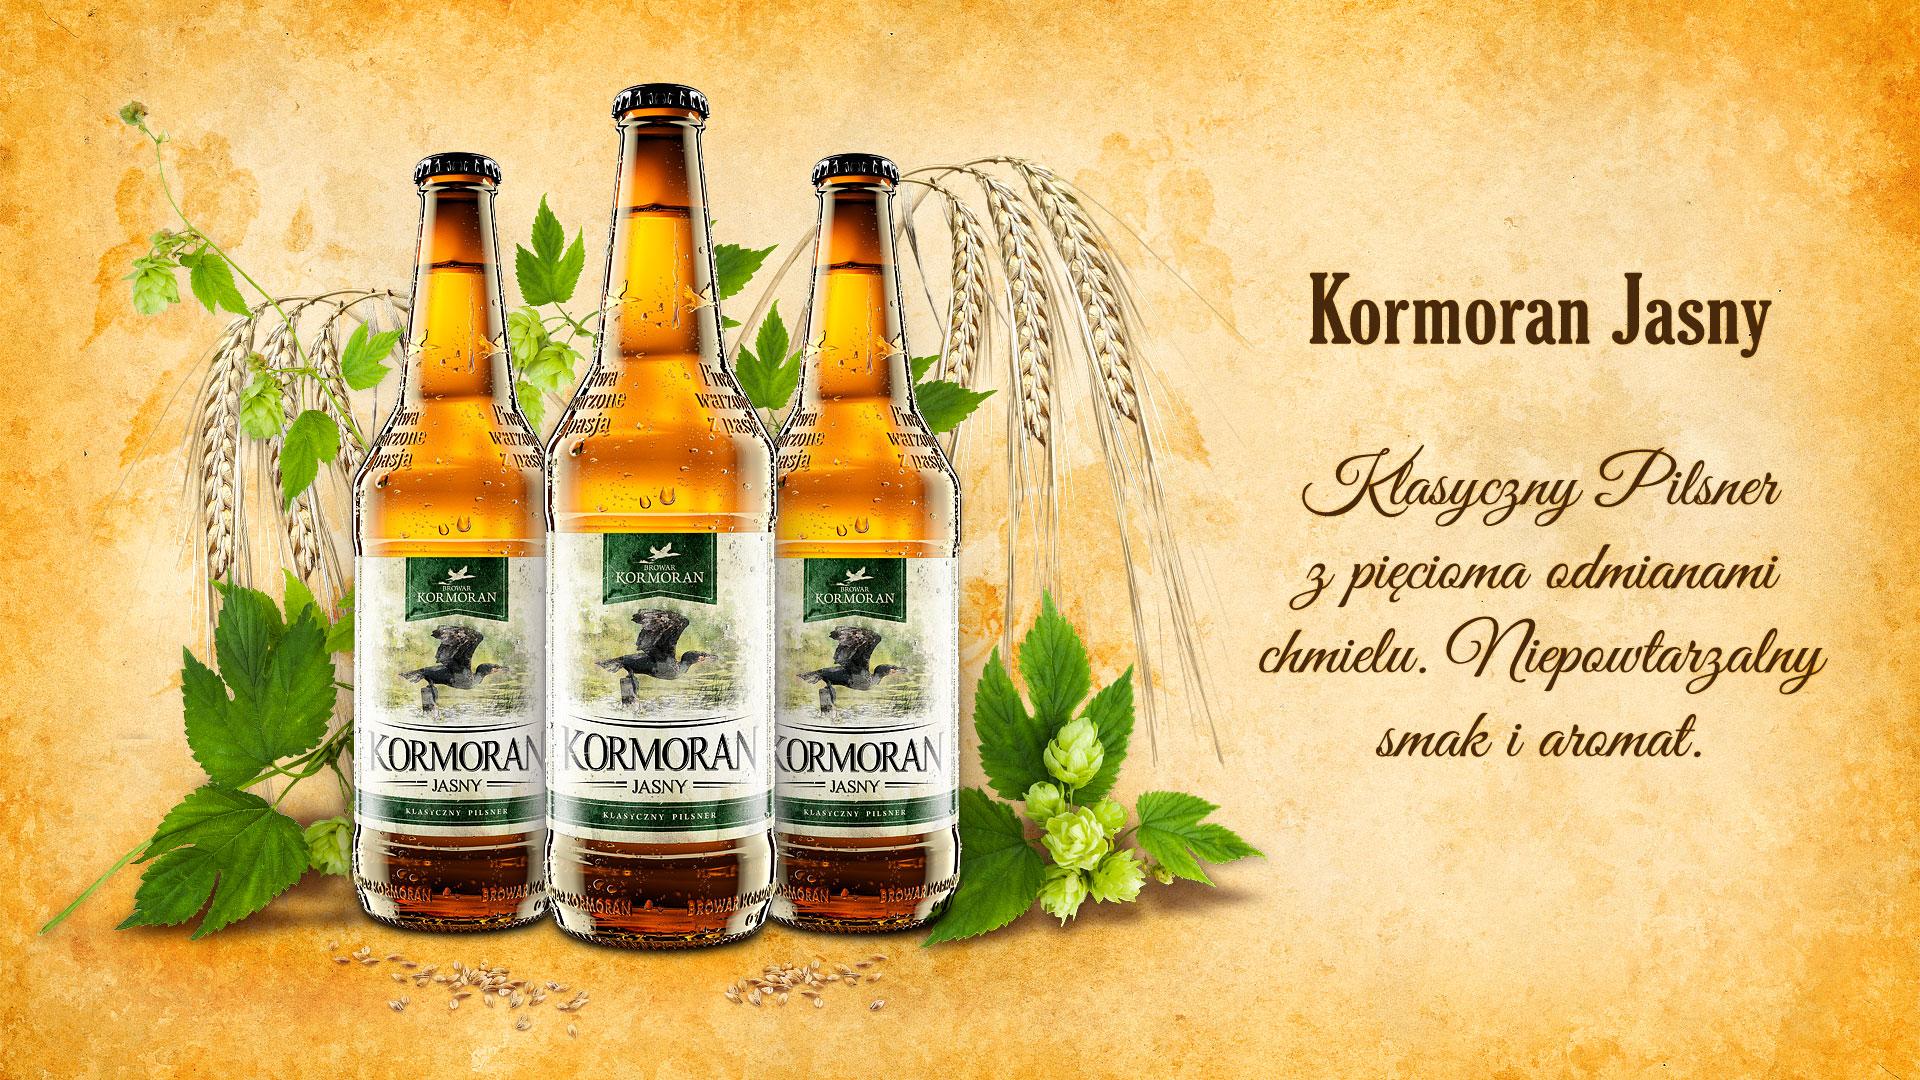 Piwo Kormoran Jasny - Browar Kormoran